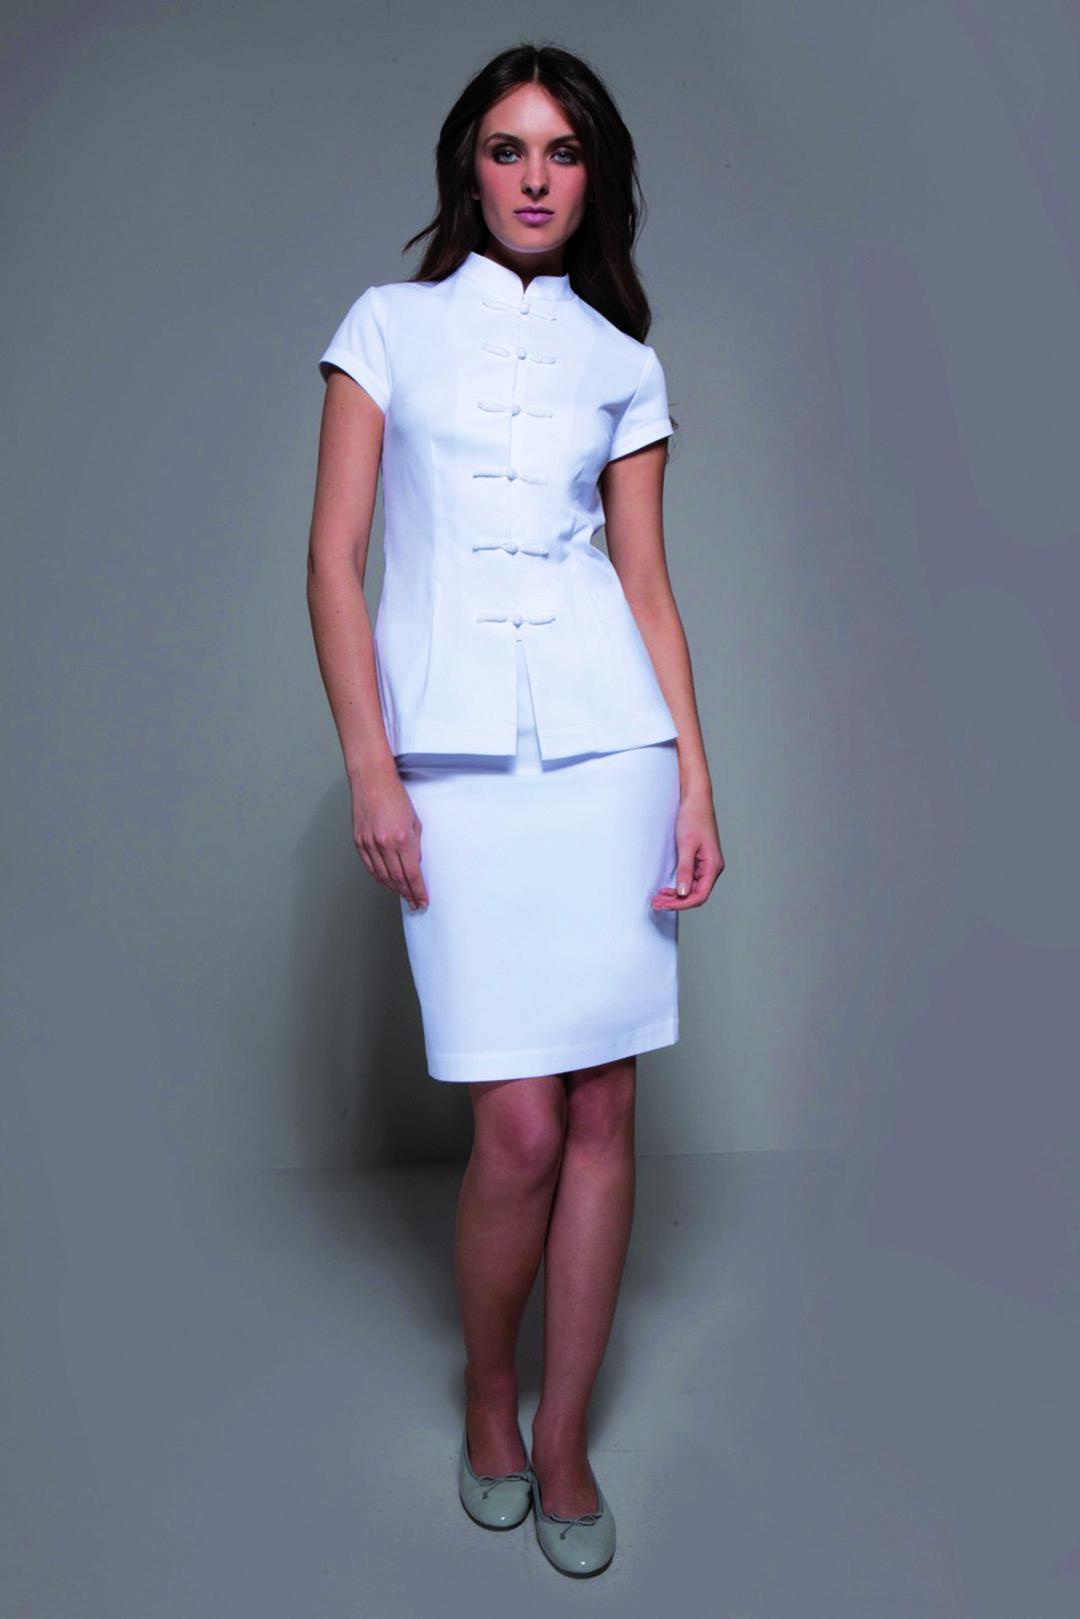 44ca942e20a STYLEMONARCHY Spa Uniforms & Medical Uniforms: Shanghai Tunic & Manhattan  Skirt